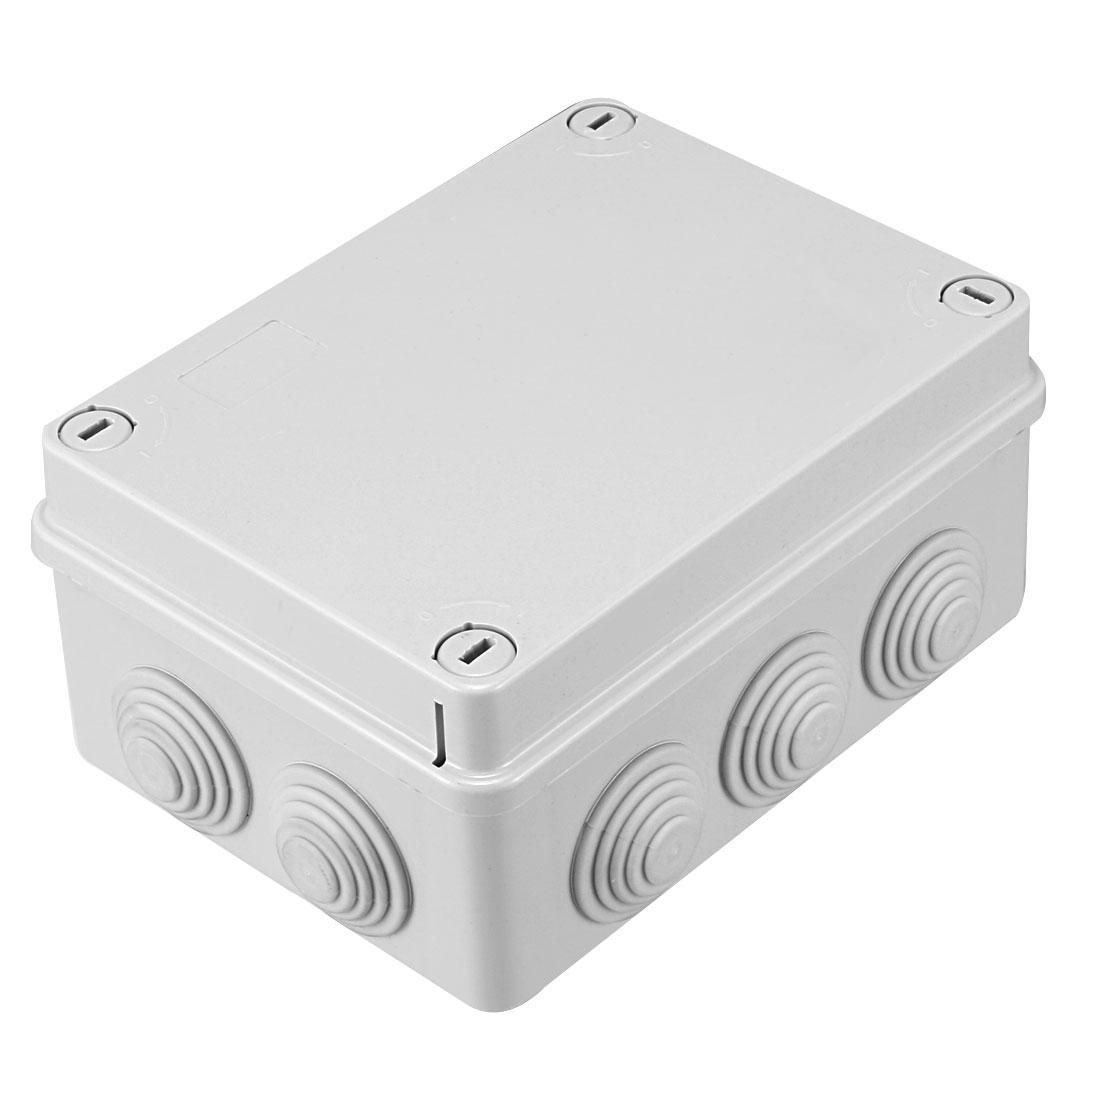 150 x 110 x 75mm Electronic ABS Plastic DIY Junction Box Enclosure Case Grey